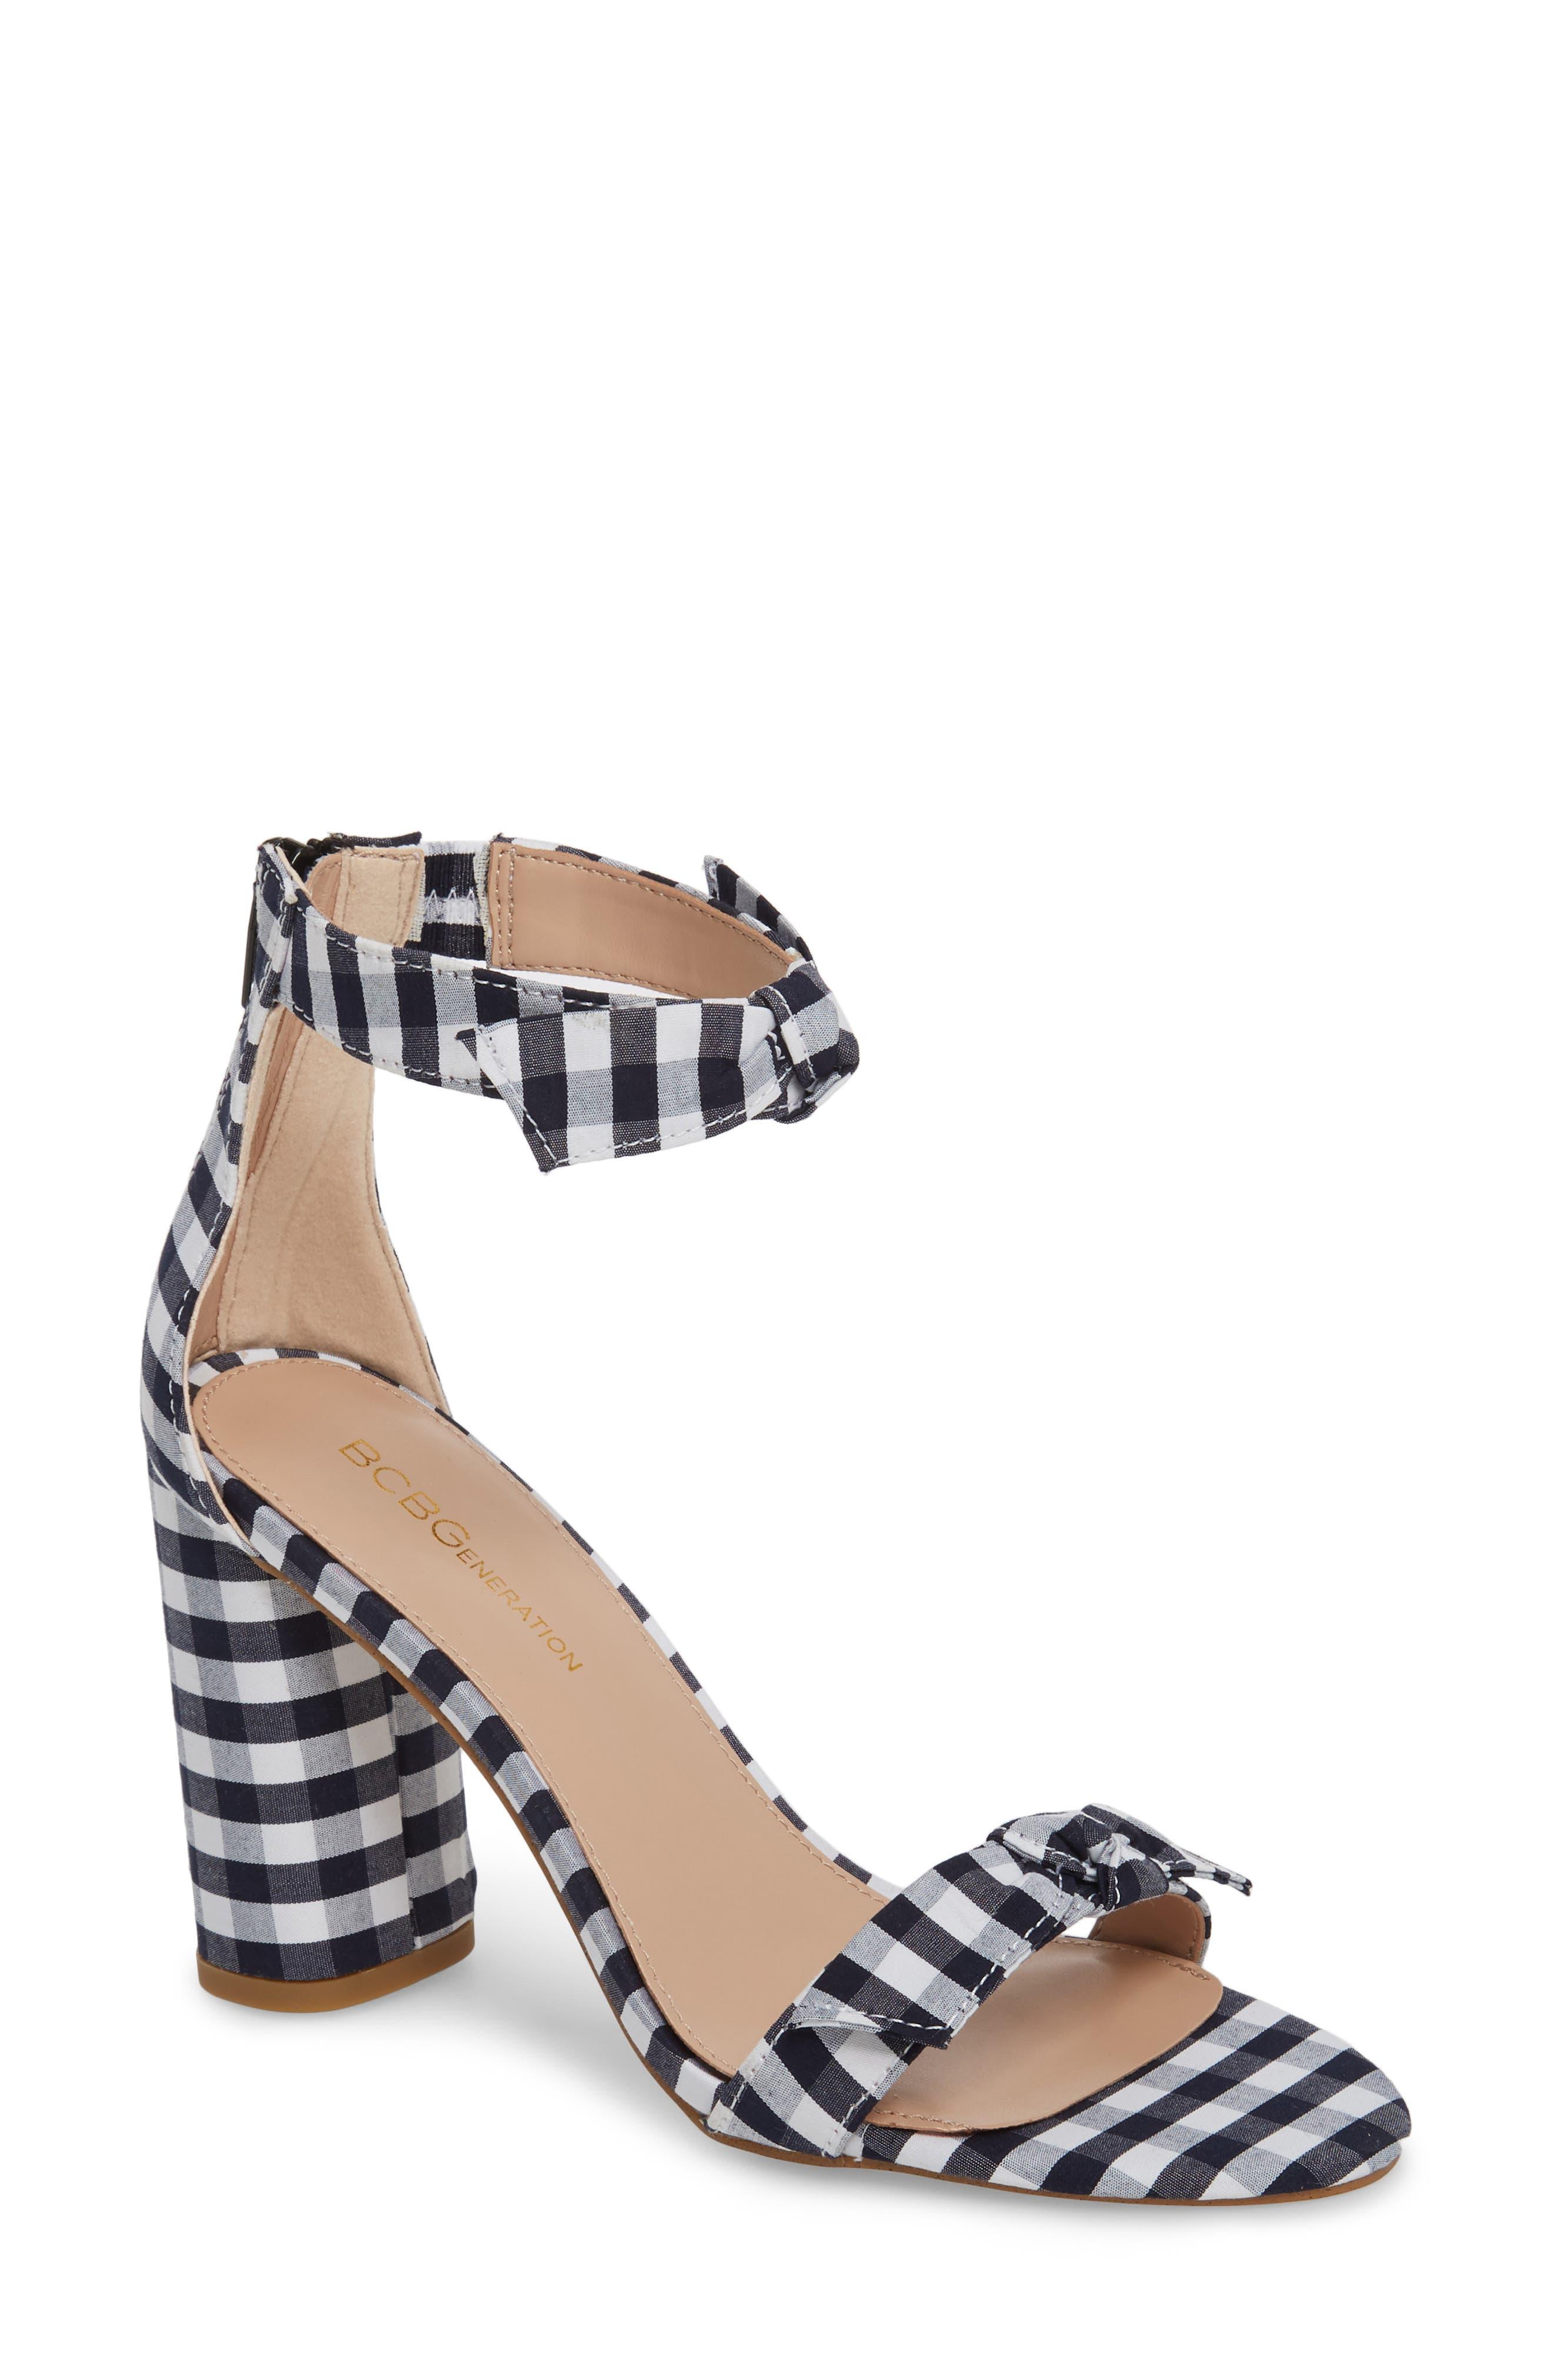 Faedra Ankle Strap Sandal,                         Main,                         color, Dark Blue/ White